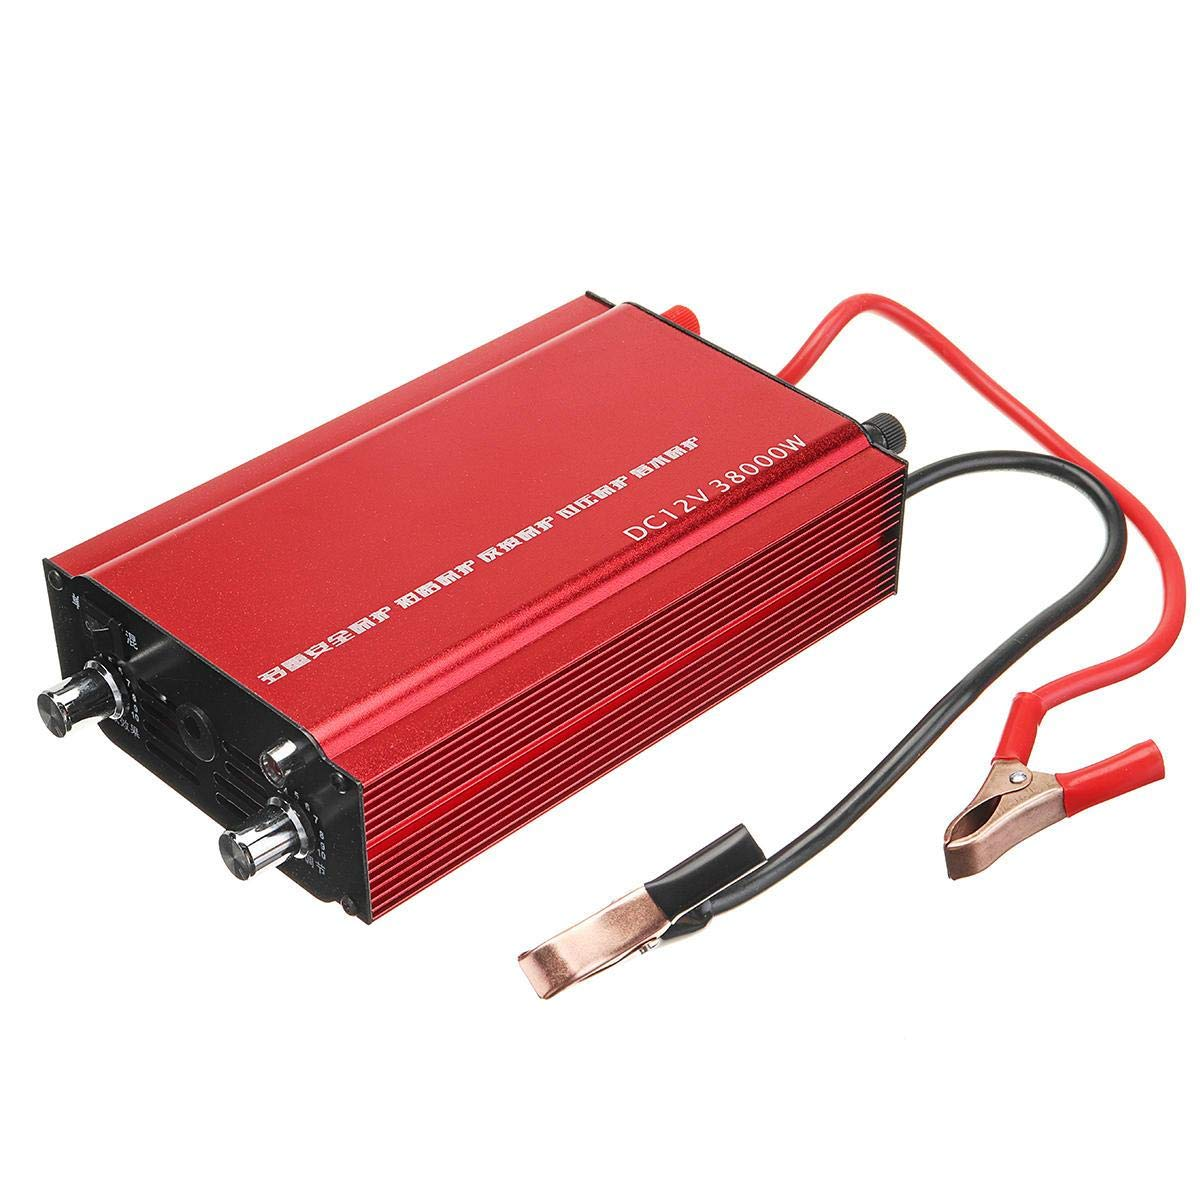 zilzol 38000W Ultrasonic Inverter Electro Fisher Fishing Machine 600V-800V Adjustable Fishing Tool